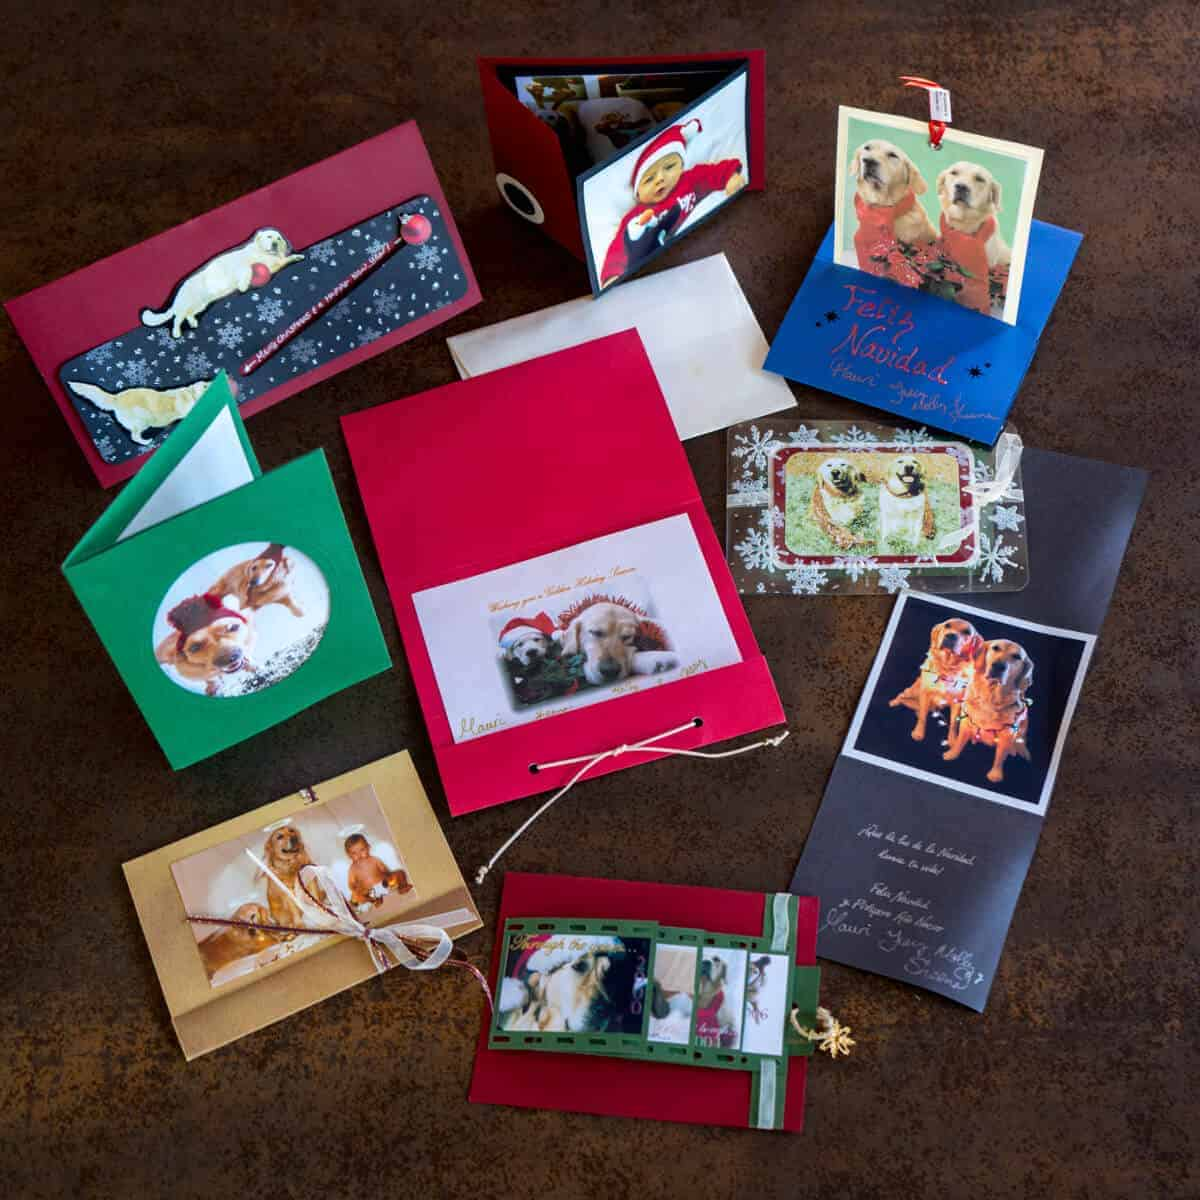 Overhead view of 9 handmade Christmas cards using photos